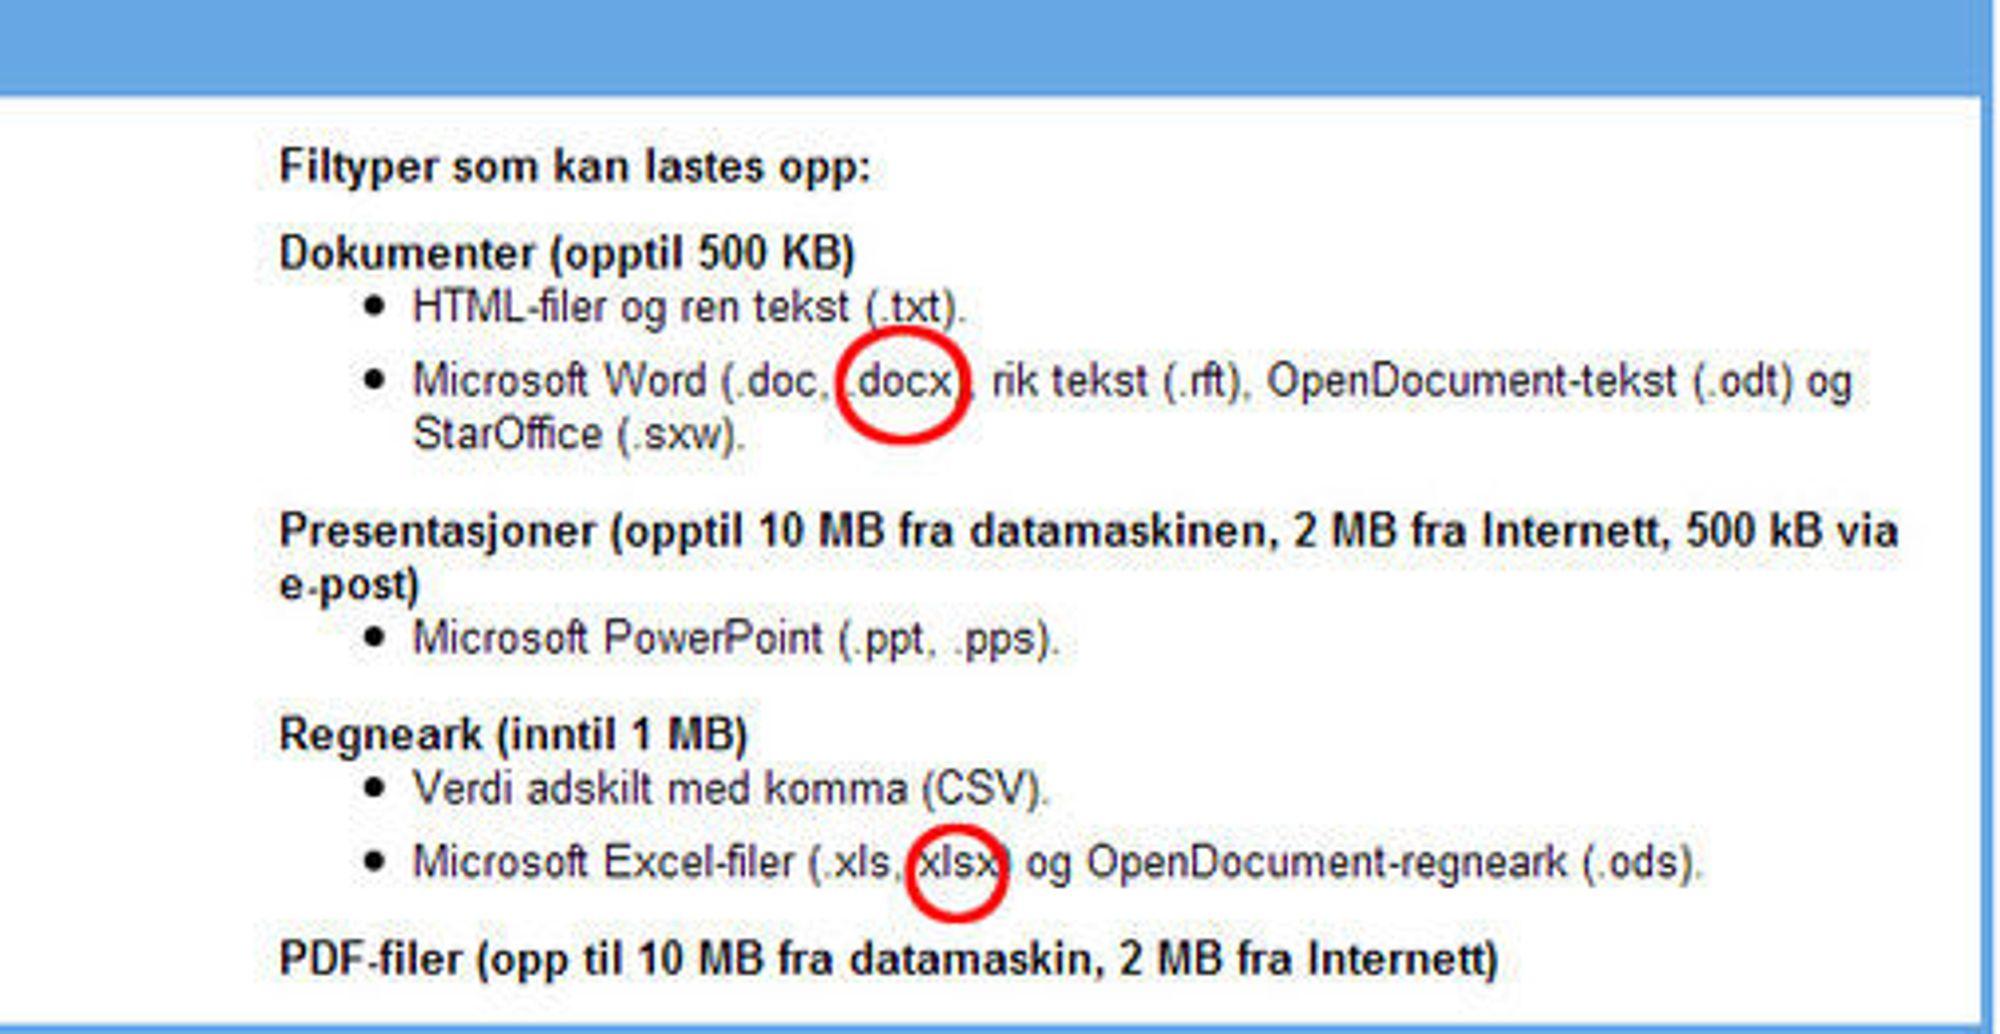 Filtyper som kan lastes opp i Google Dokumenter.